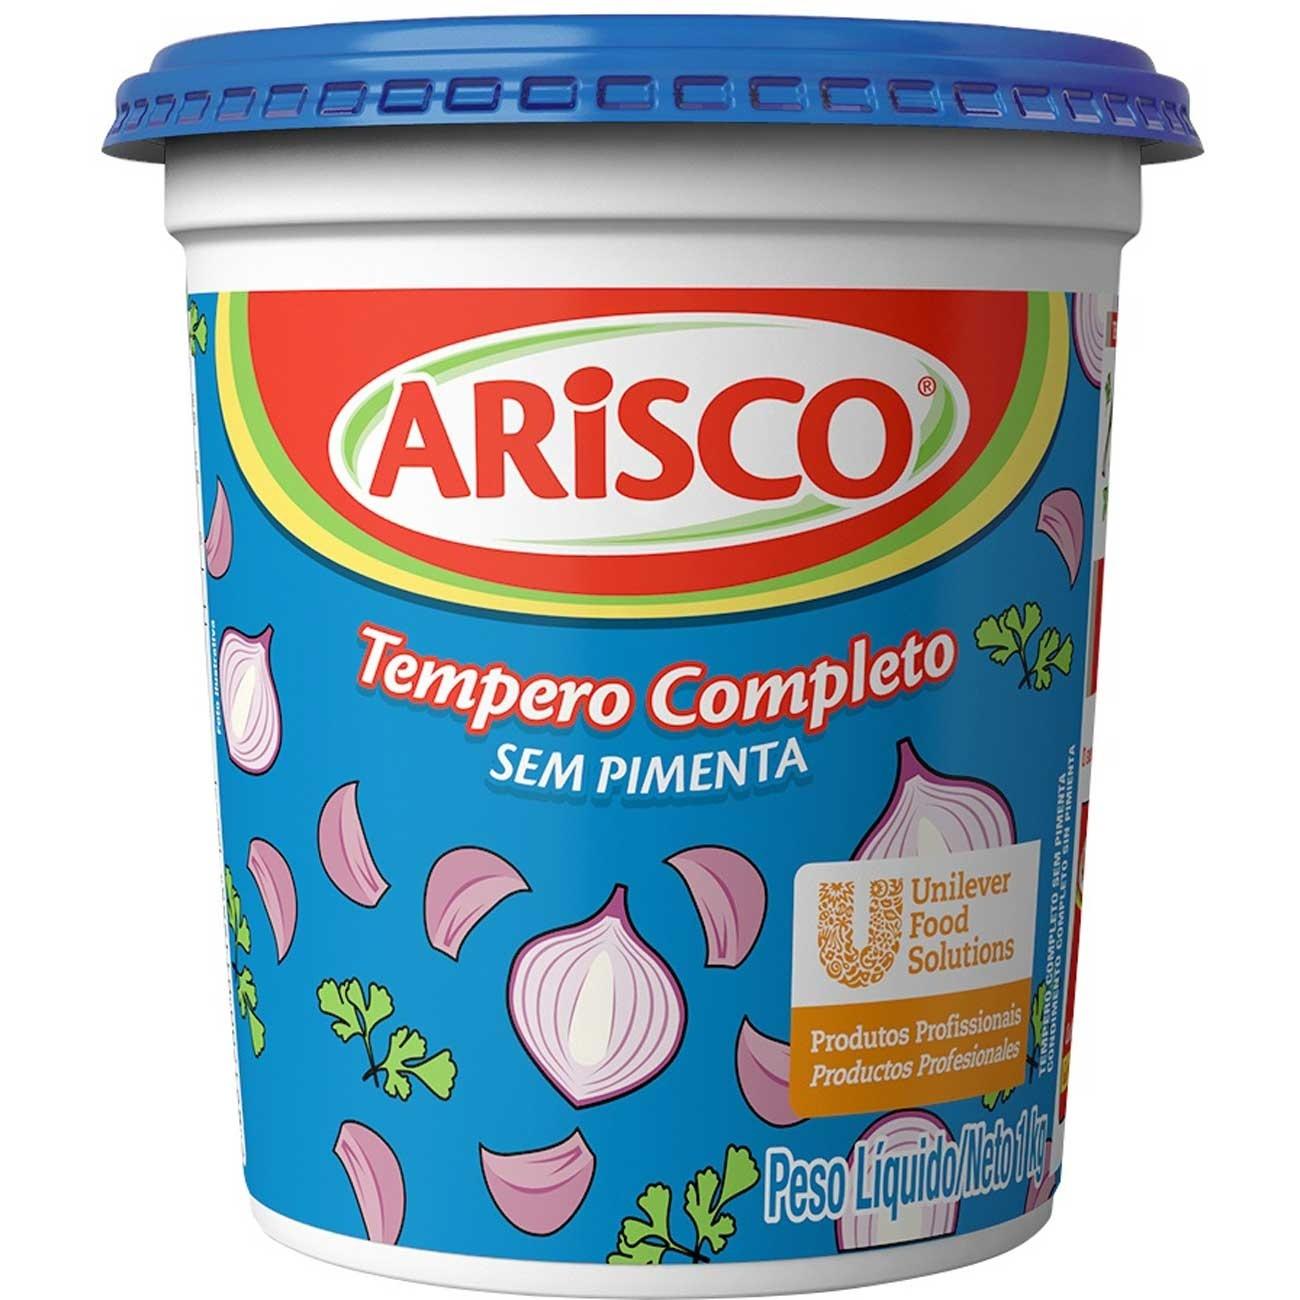 Tempero Arisco Completo Sem Pimenta 1kg | 1 unidades